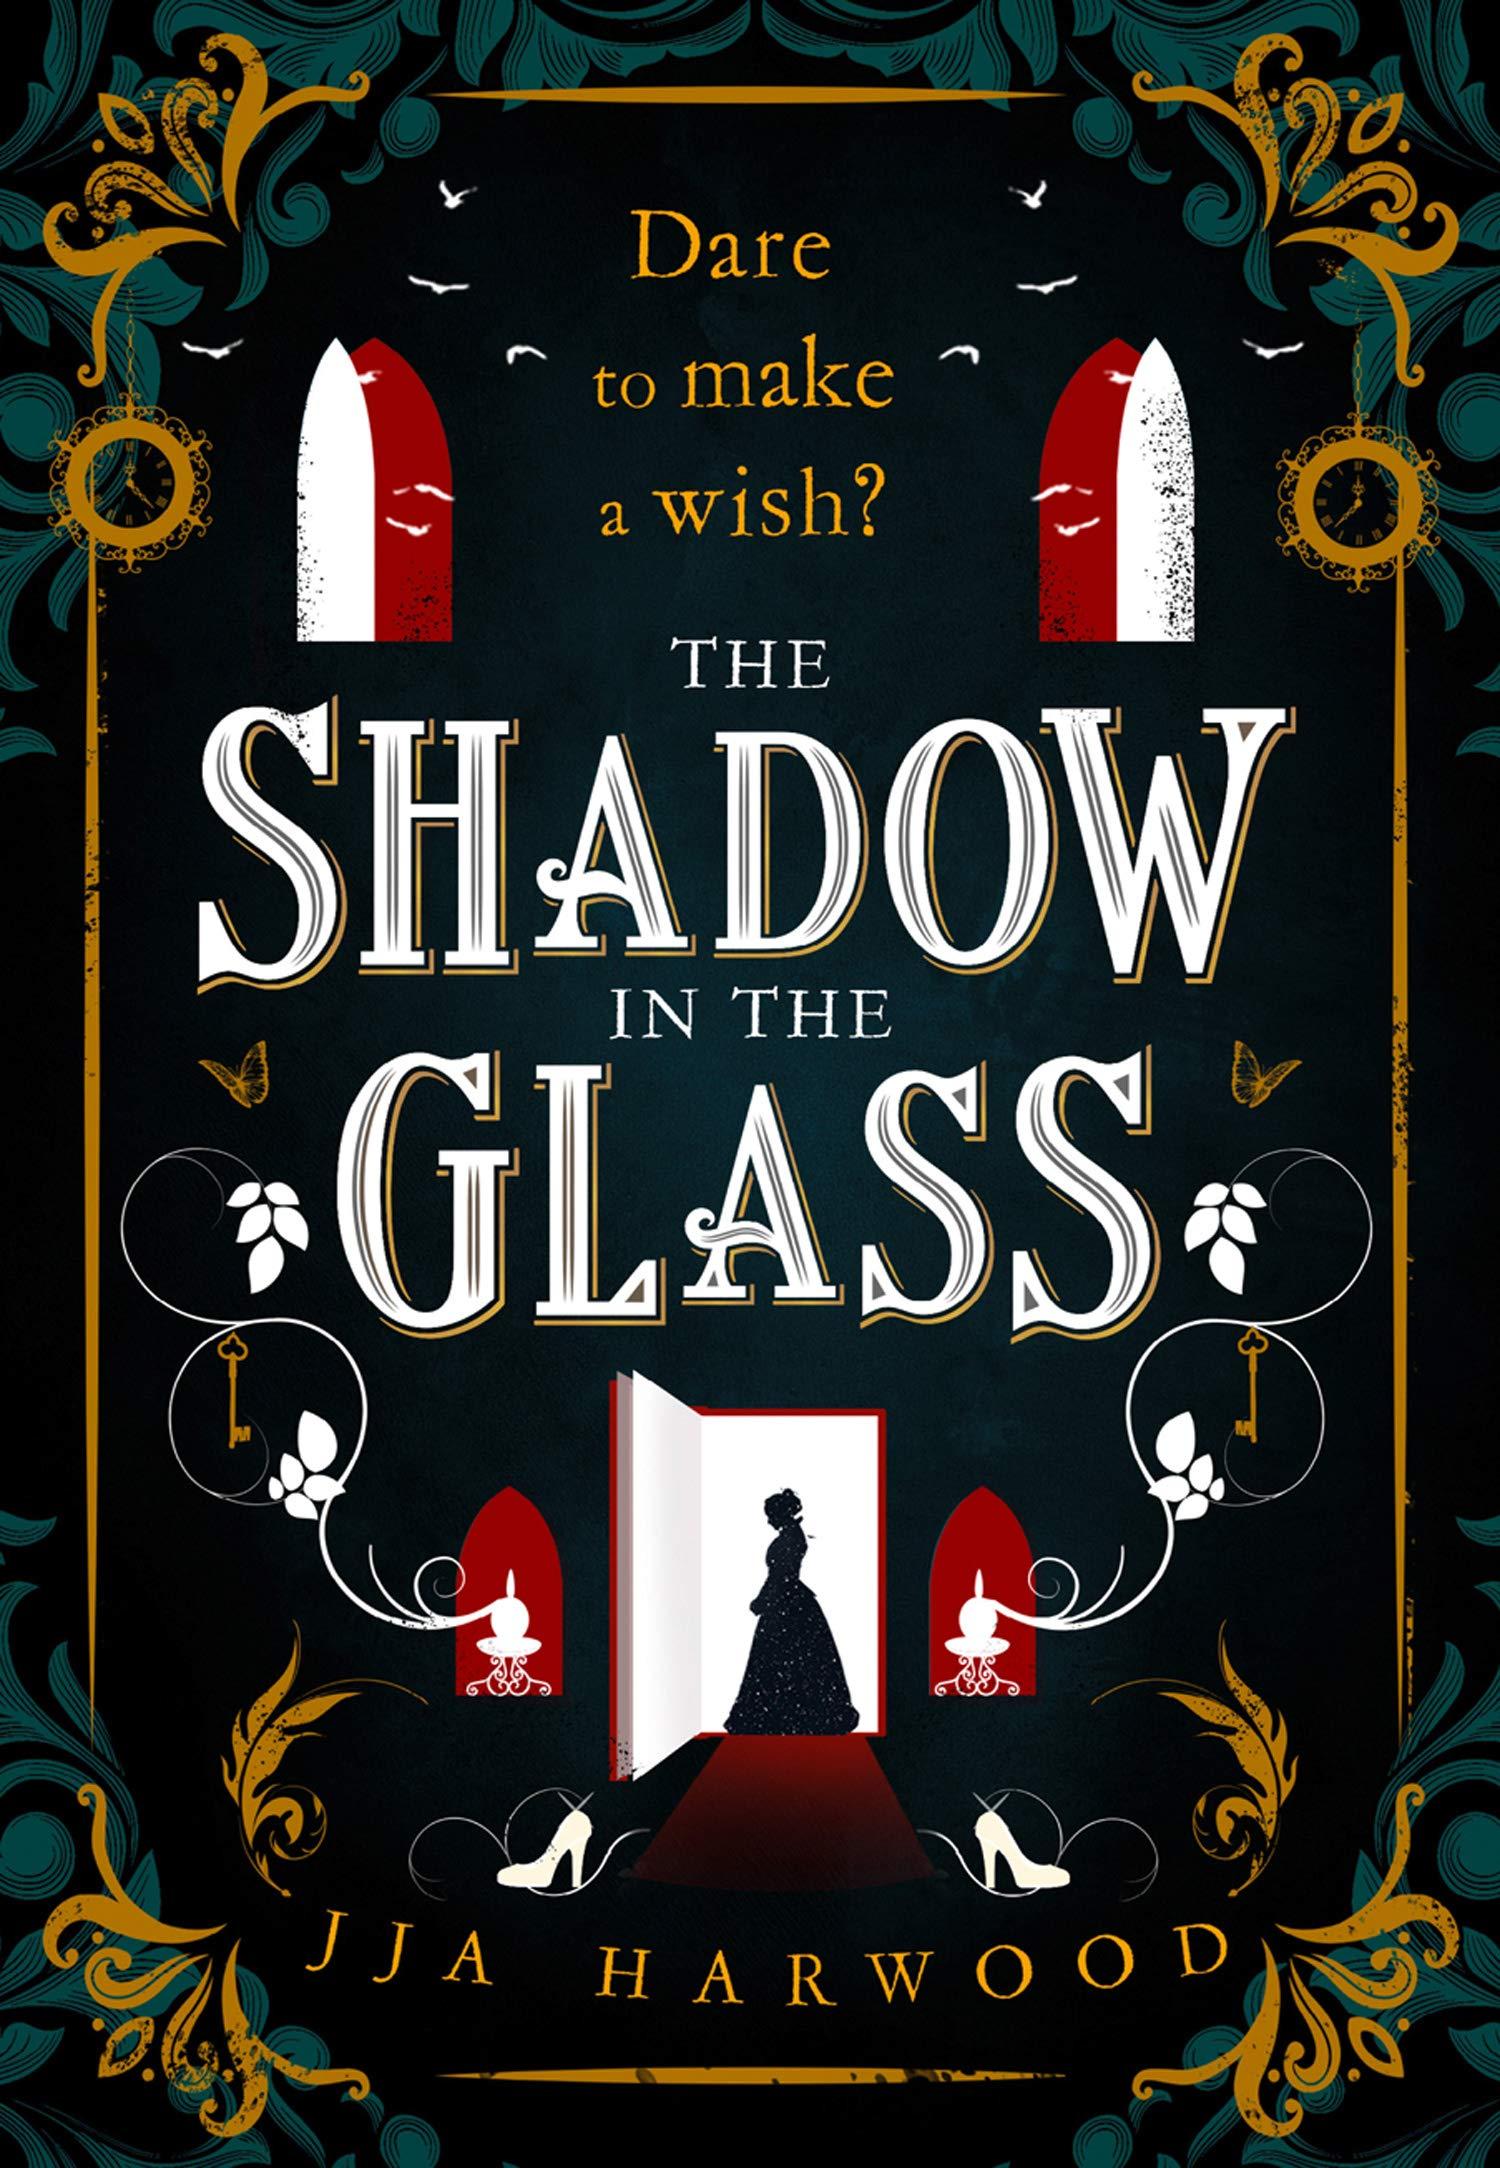 The Shadow in the Glass: Amazon.co.uk: Harwood, JJA: 9780008368098: Books